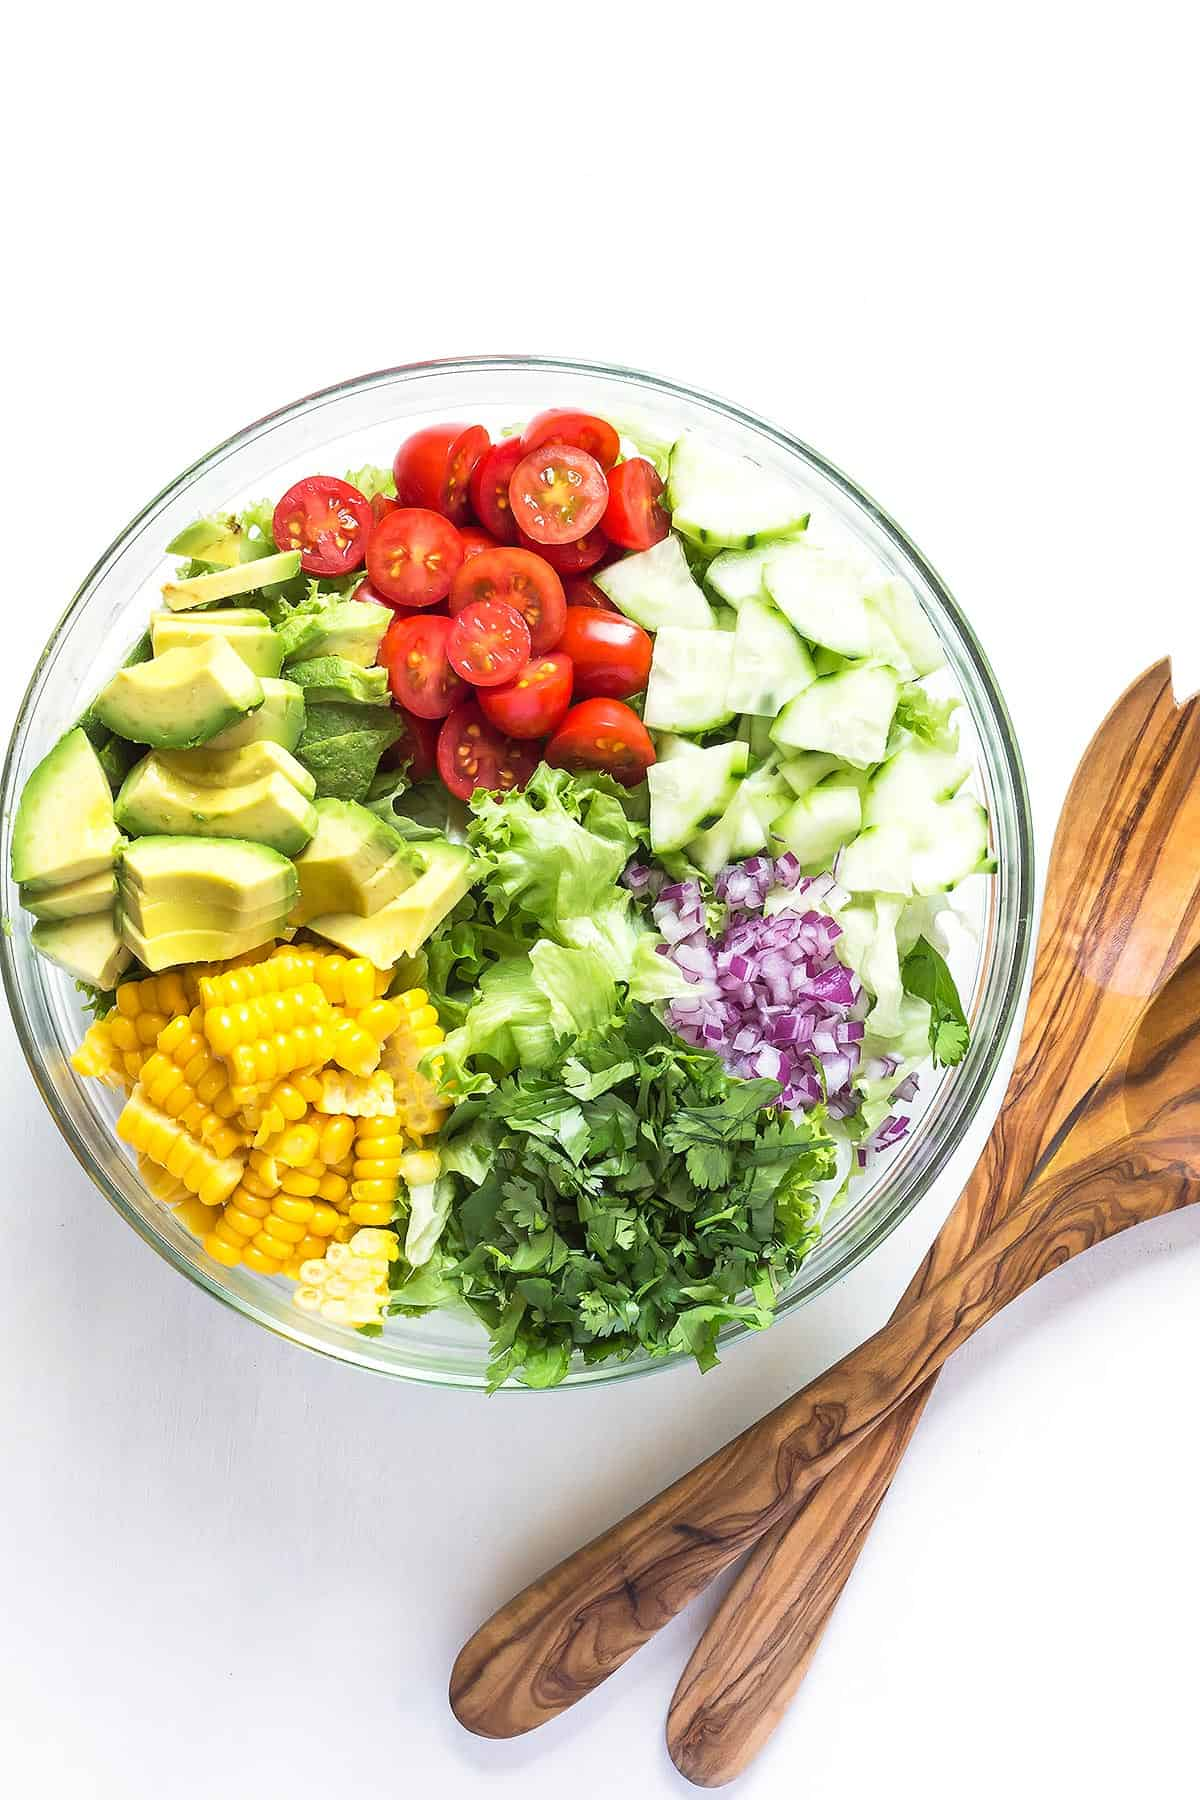 Assembled Corn and Avocado Salad